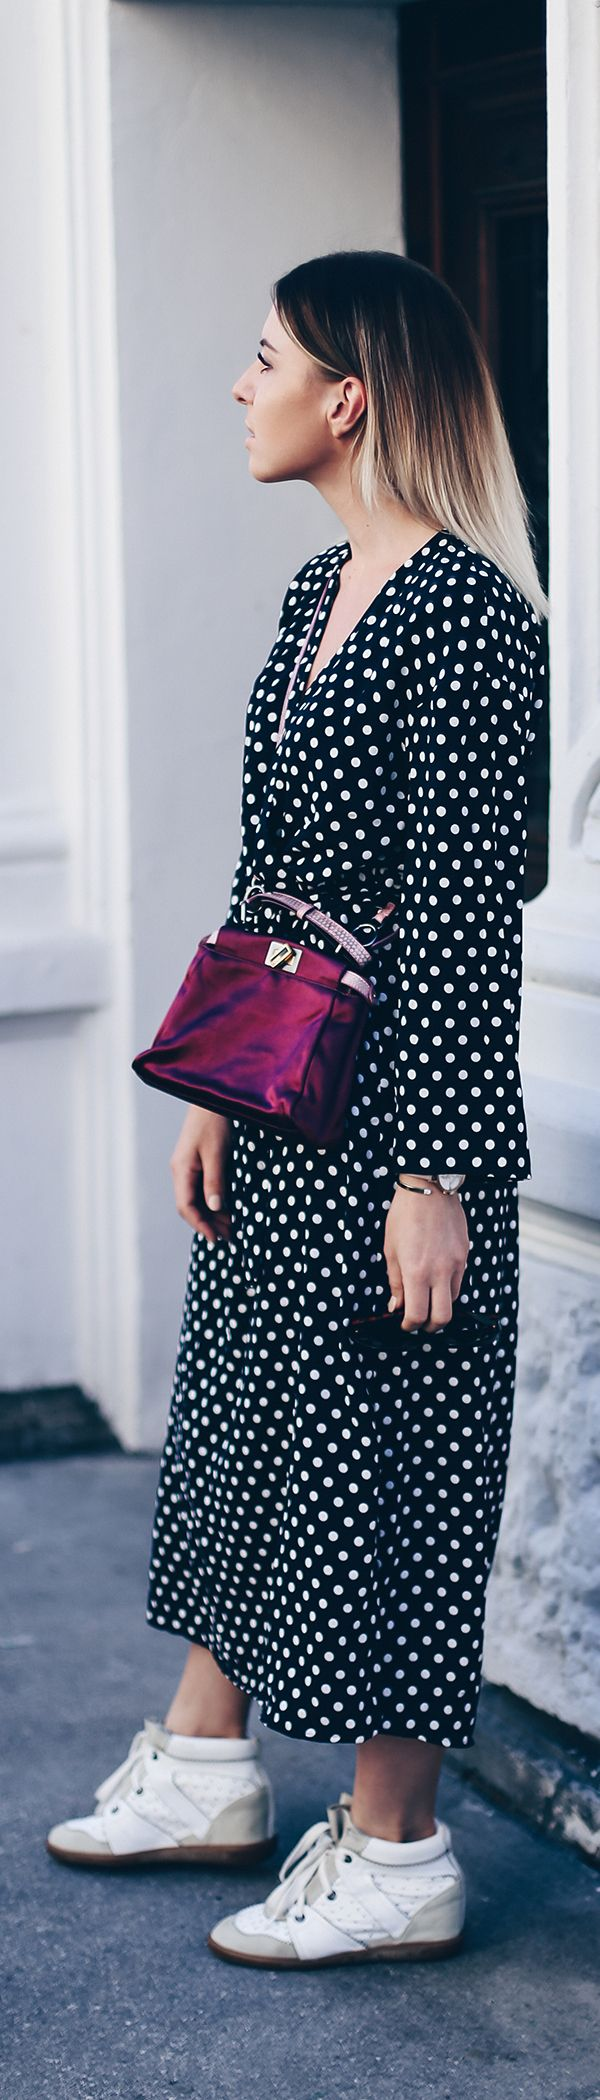 Polka Dots Kleid stylen, Herbst Trends, Sneaker Wedges Isabel Marant, Fendi Peekaboo Bag, Streetstyle, Outfit Ideen, Fashion Blog, Modeblog, Outfit Blog, www.whoismocca.com